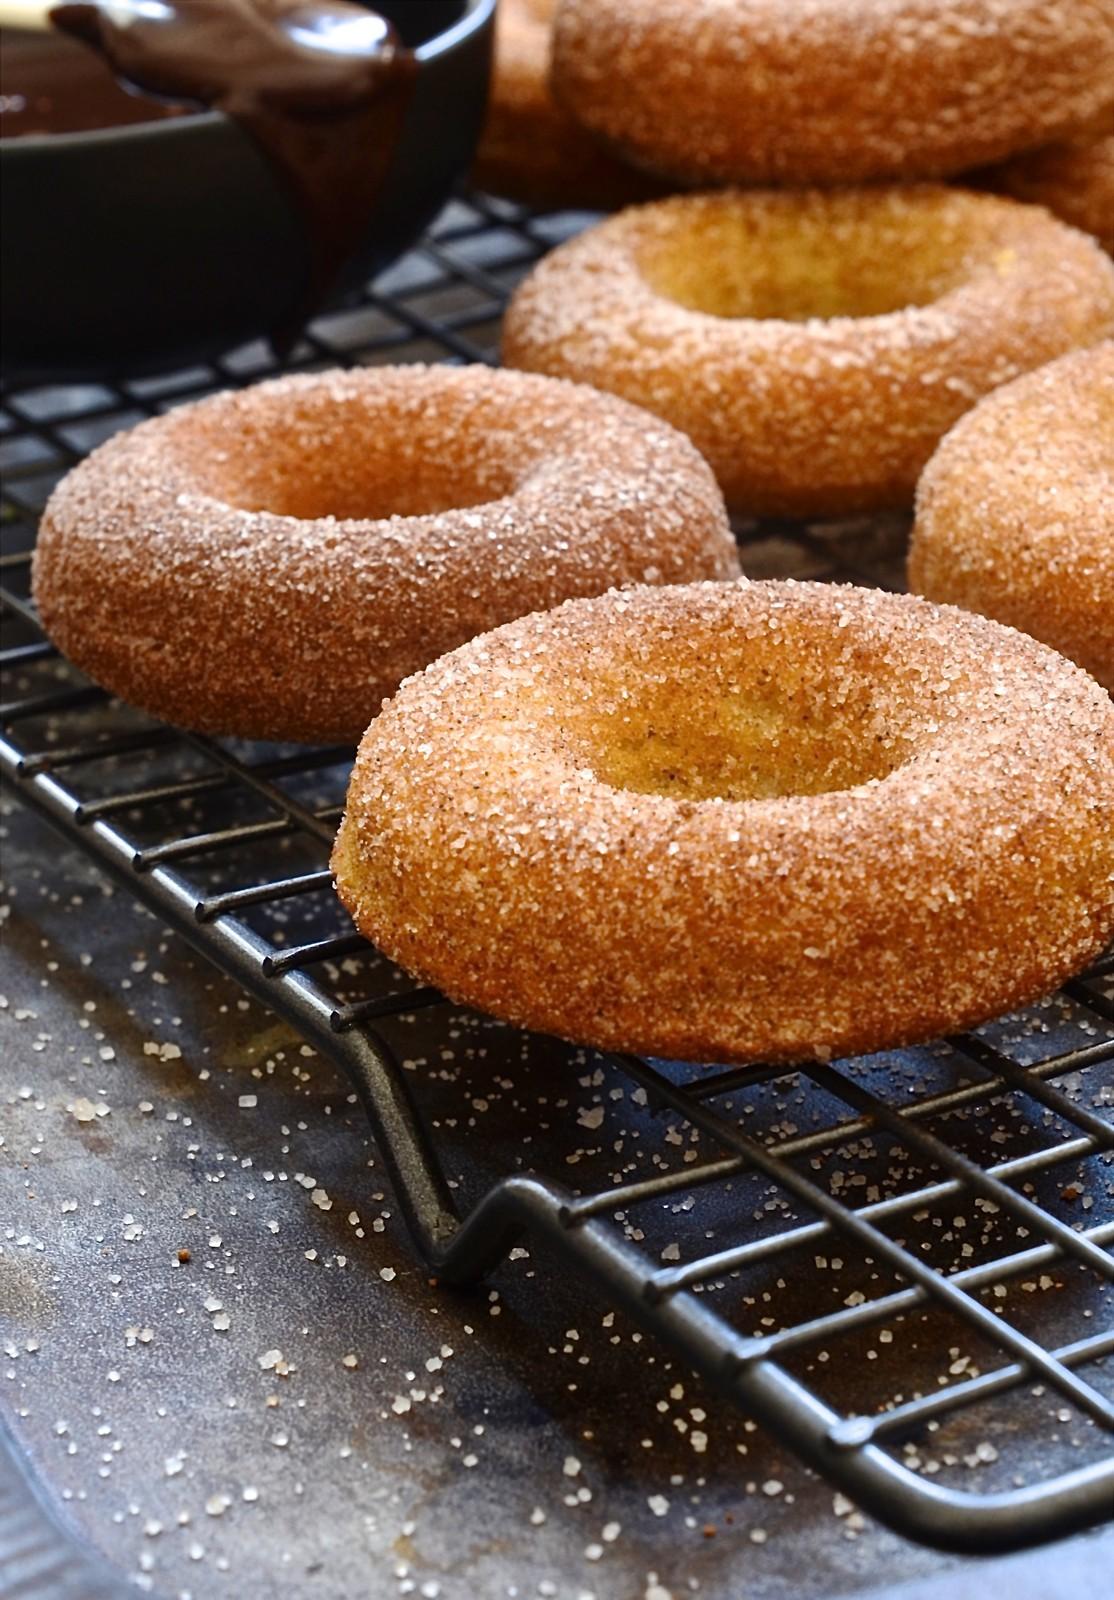 Baked donuts with cinnamon-chocolate ganache | Bibbyskitchen recipes